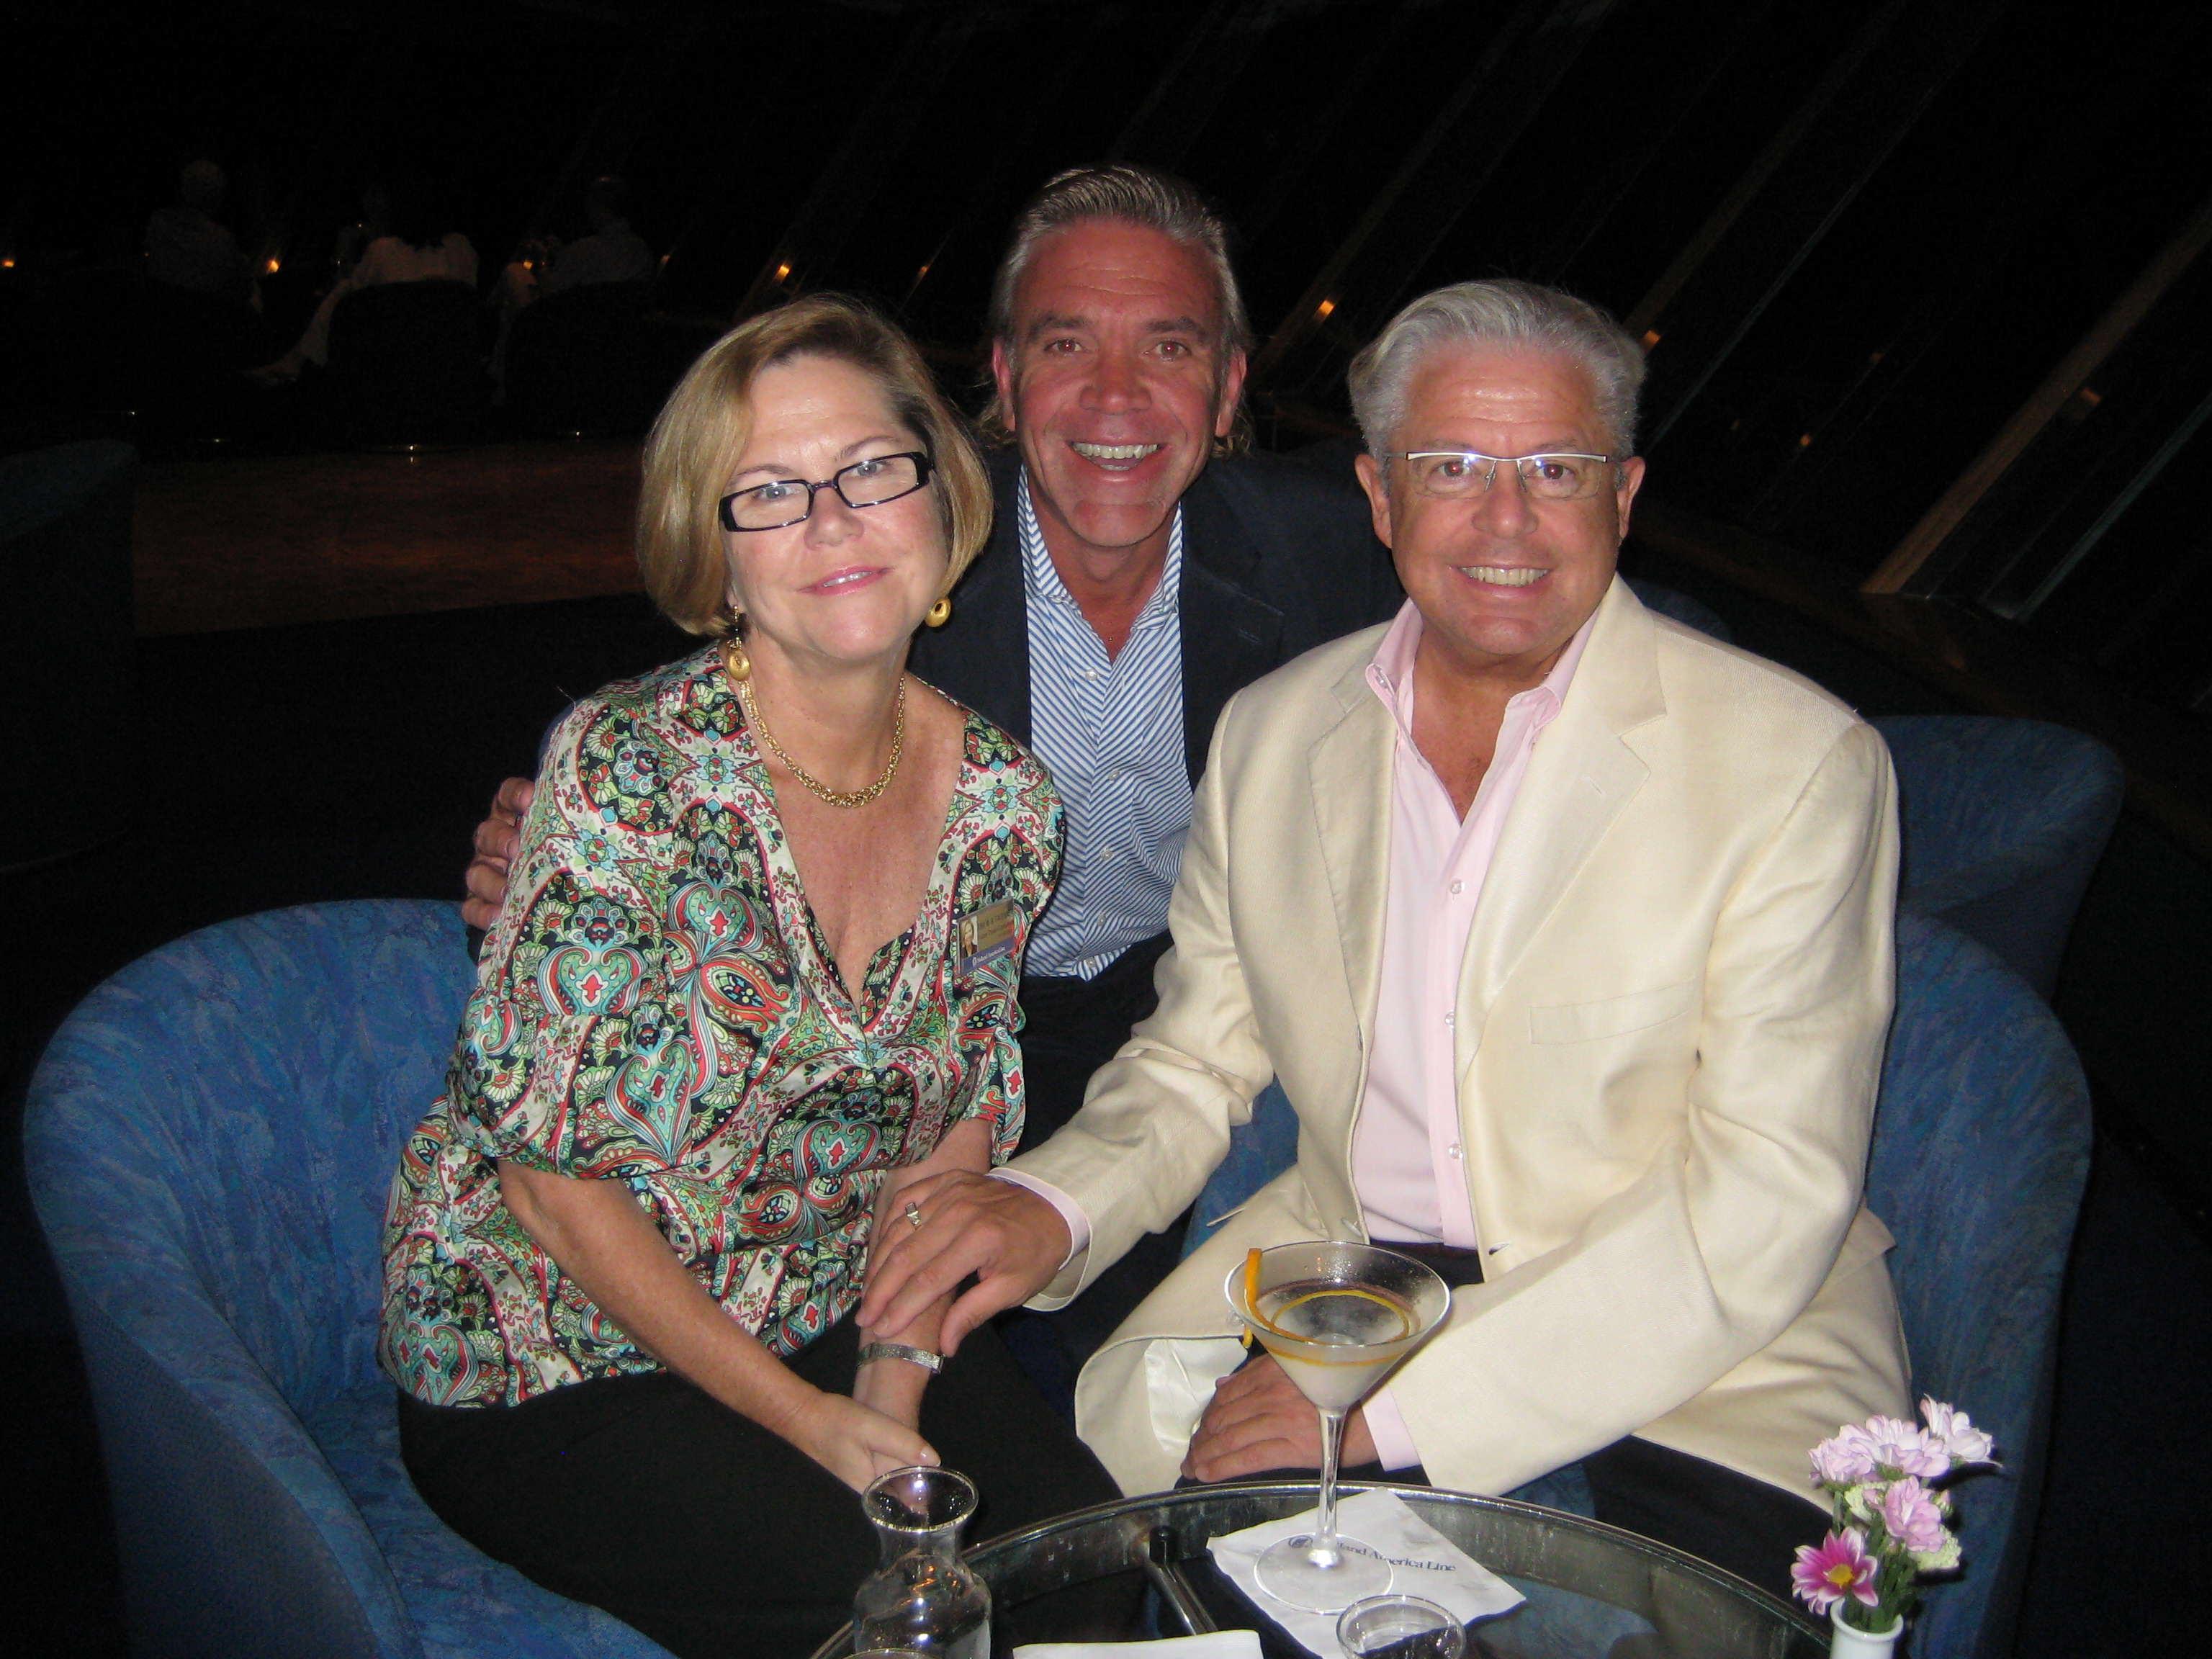 Tina Faulkner, Onboard Cruise Consultant; Tom Baumann, President Cruise Specialists; Gerald Bernhoft